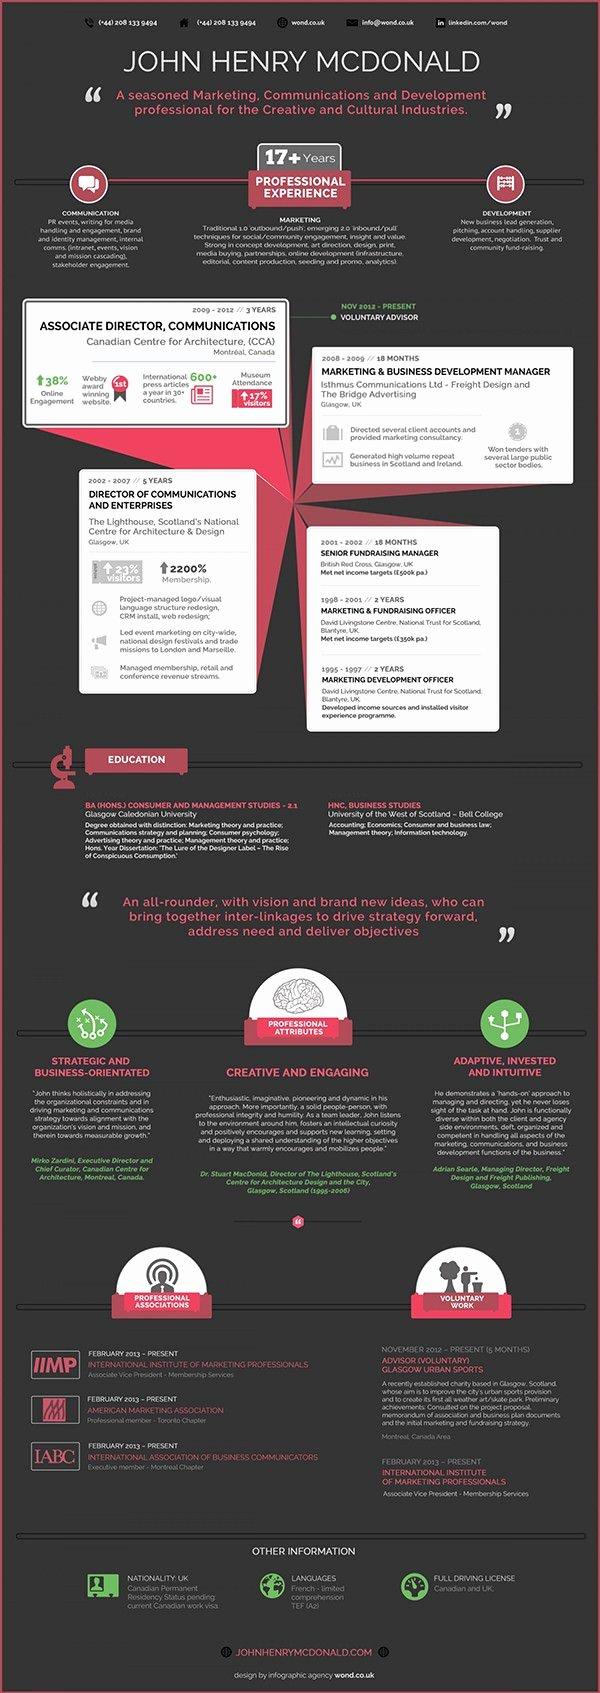 Infographic Resume Template Free Luxury 33 Infographic Resume Templates Free Sample Example